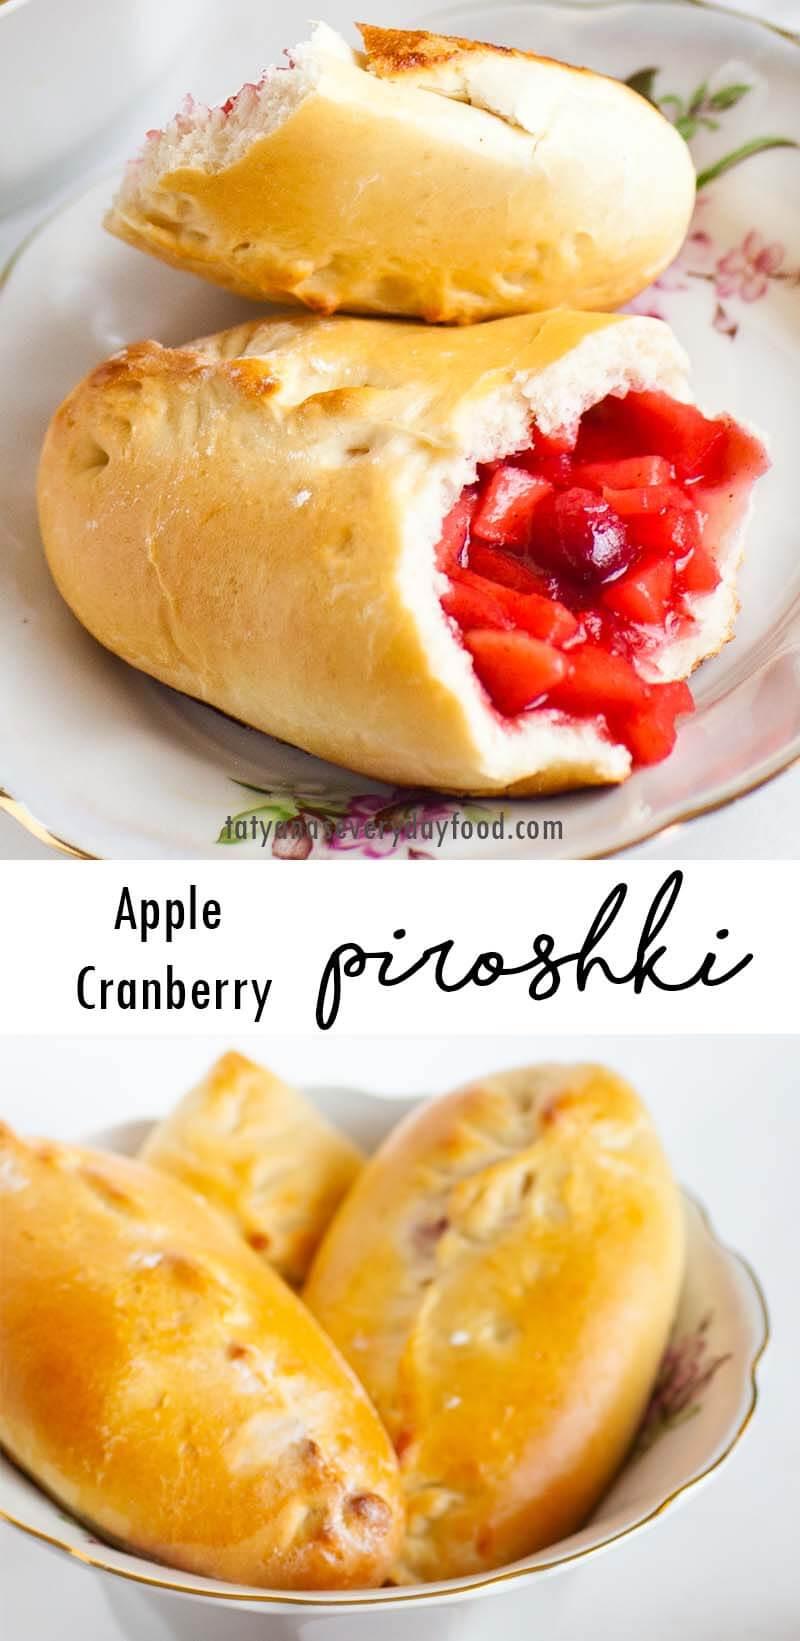 Cranberry Apple Piroshki video recipe